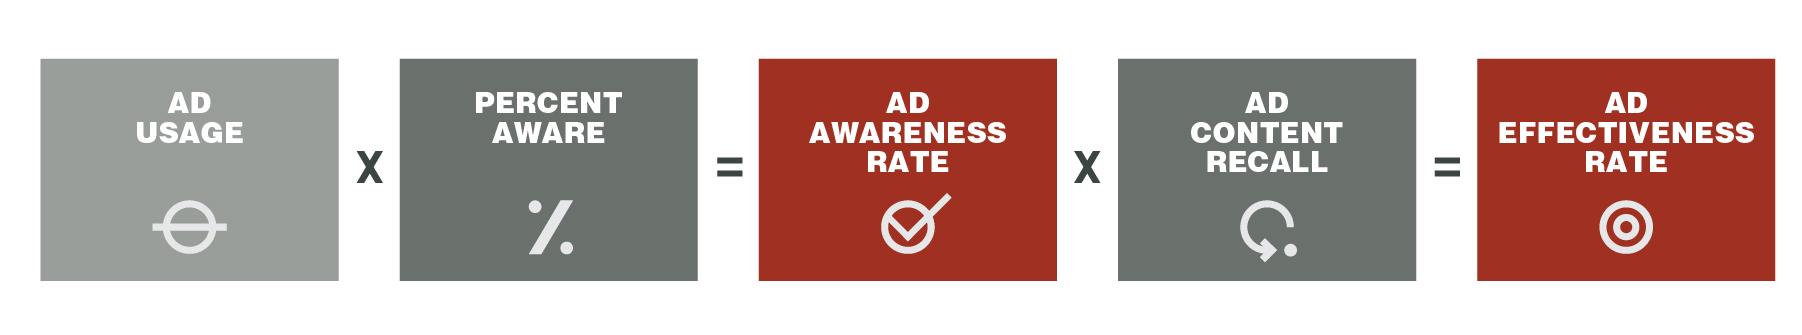 Ad Effectiveness Formula